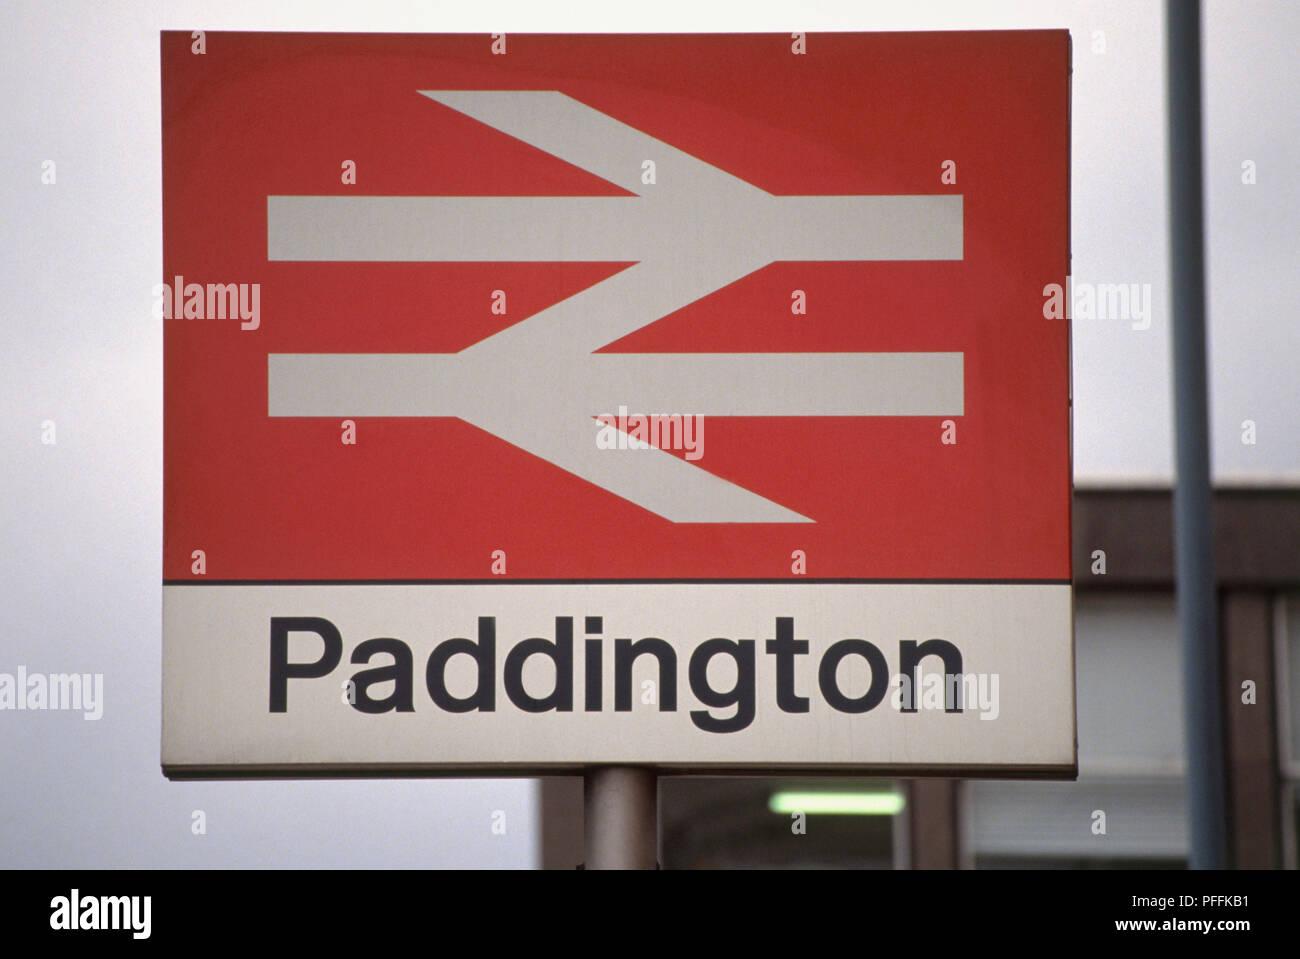 Great Britain, England, London, Paddington Railway Station, British